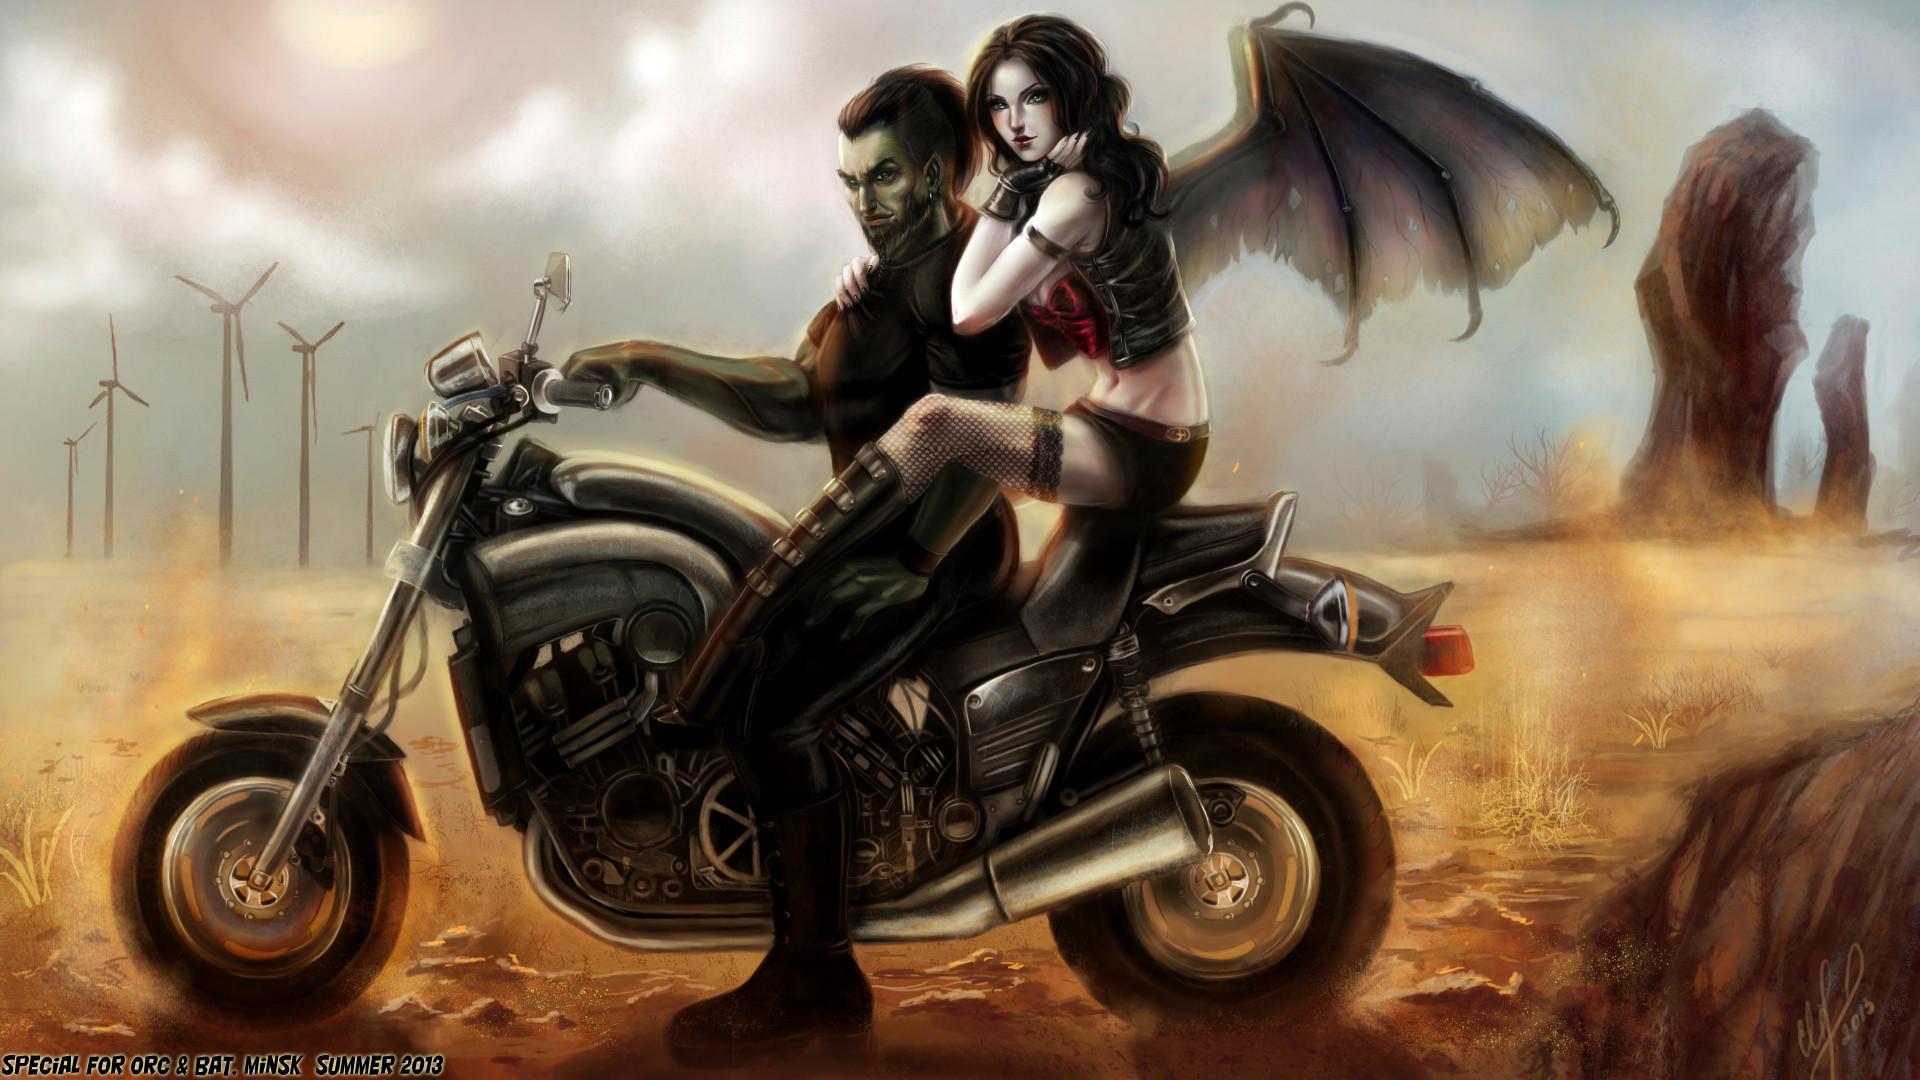 Angel Girl And Skulls Wallpaper Motorcycle Girl Wallpaper 70 Images